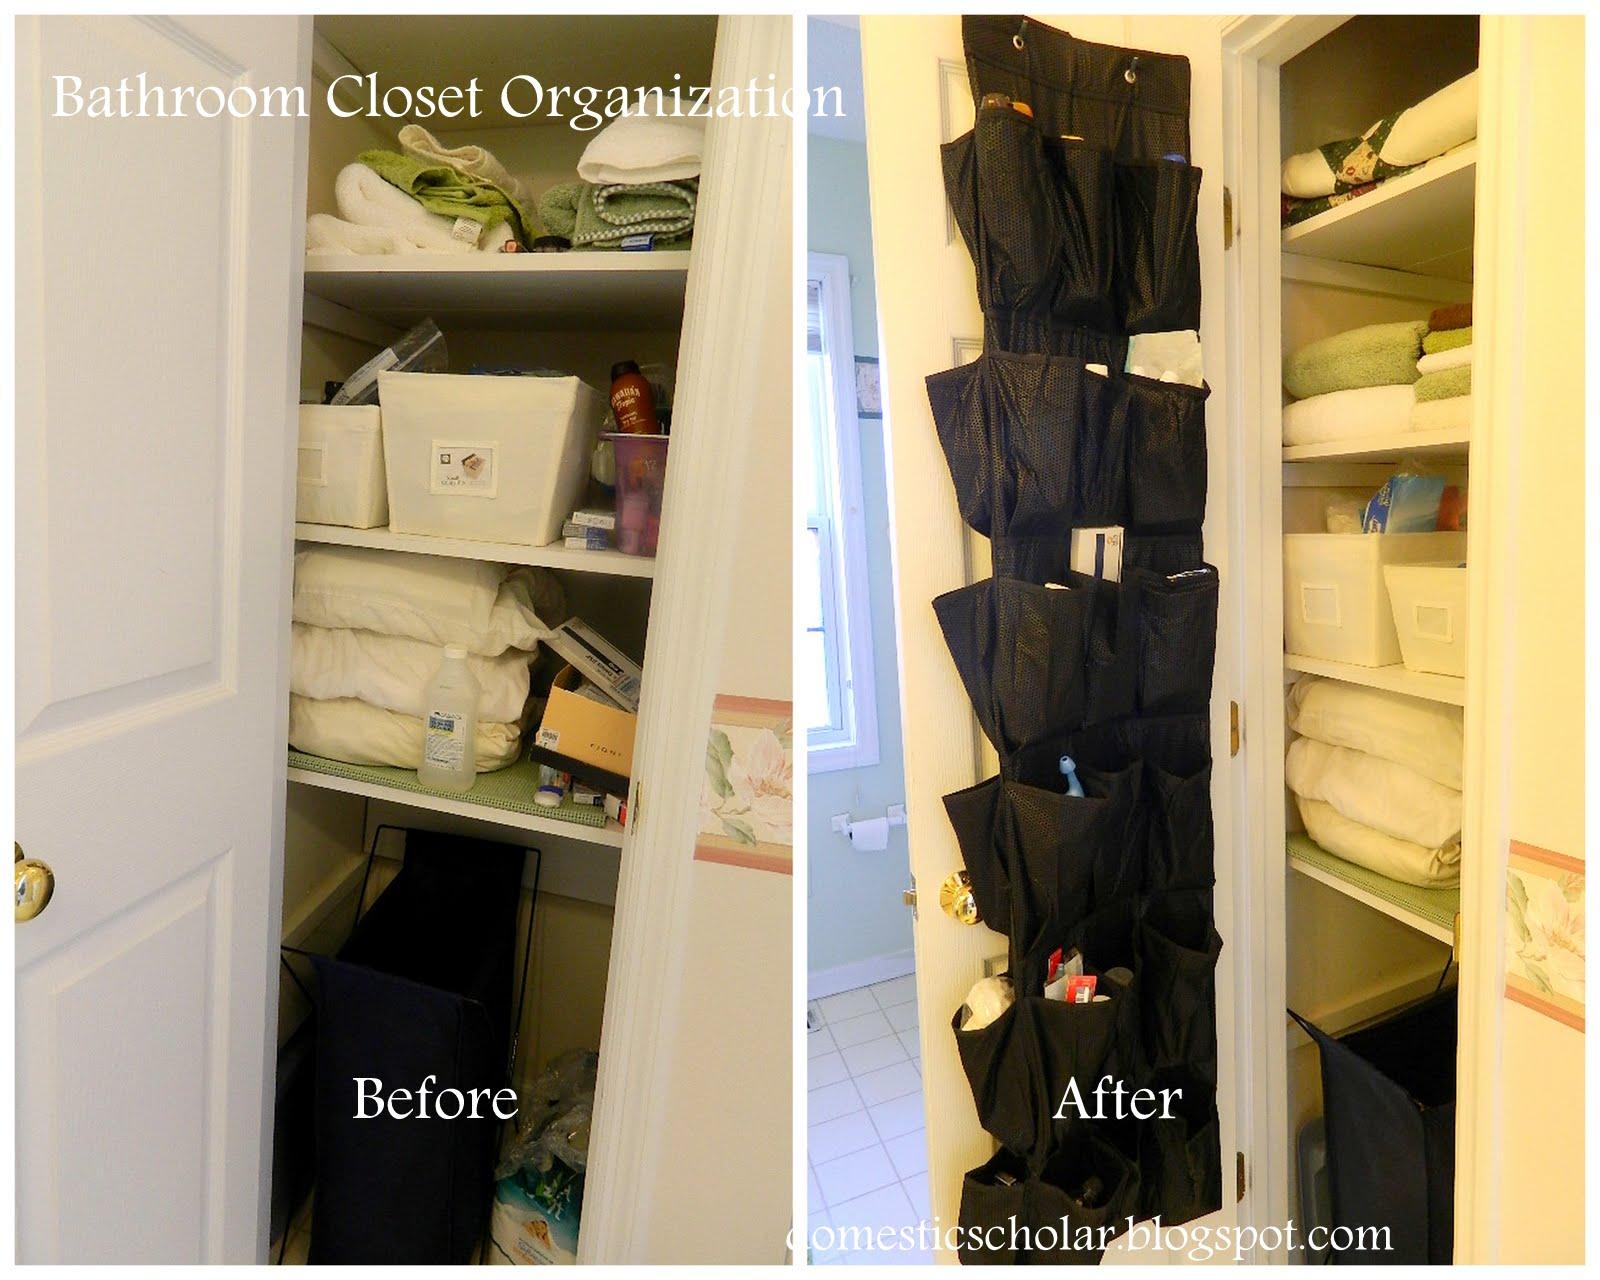 Bathroom Closet Organization Or Novel Uses For Shoe Organizers